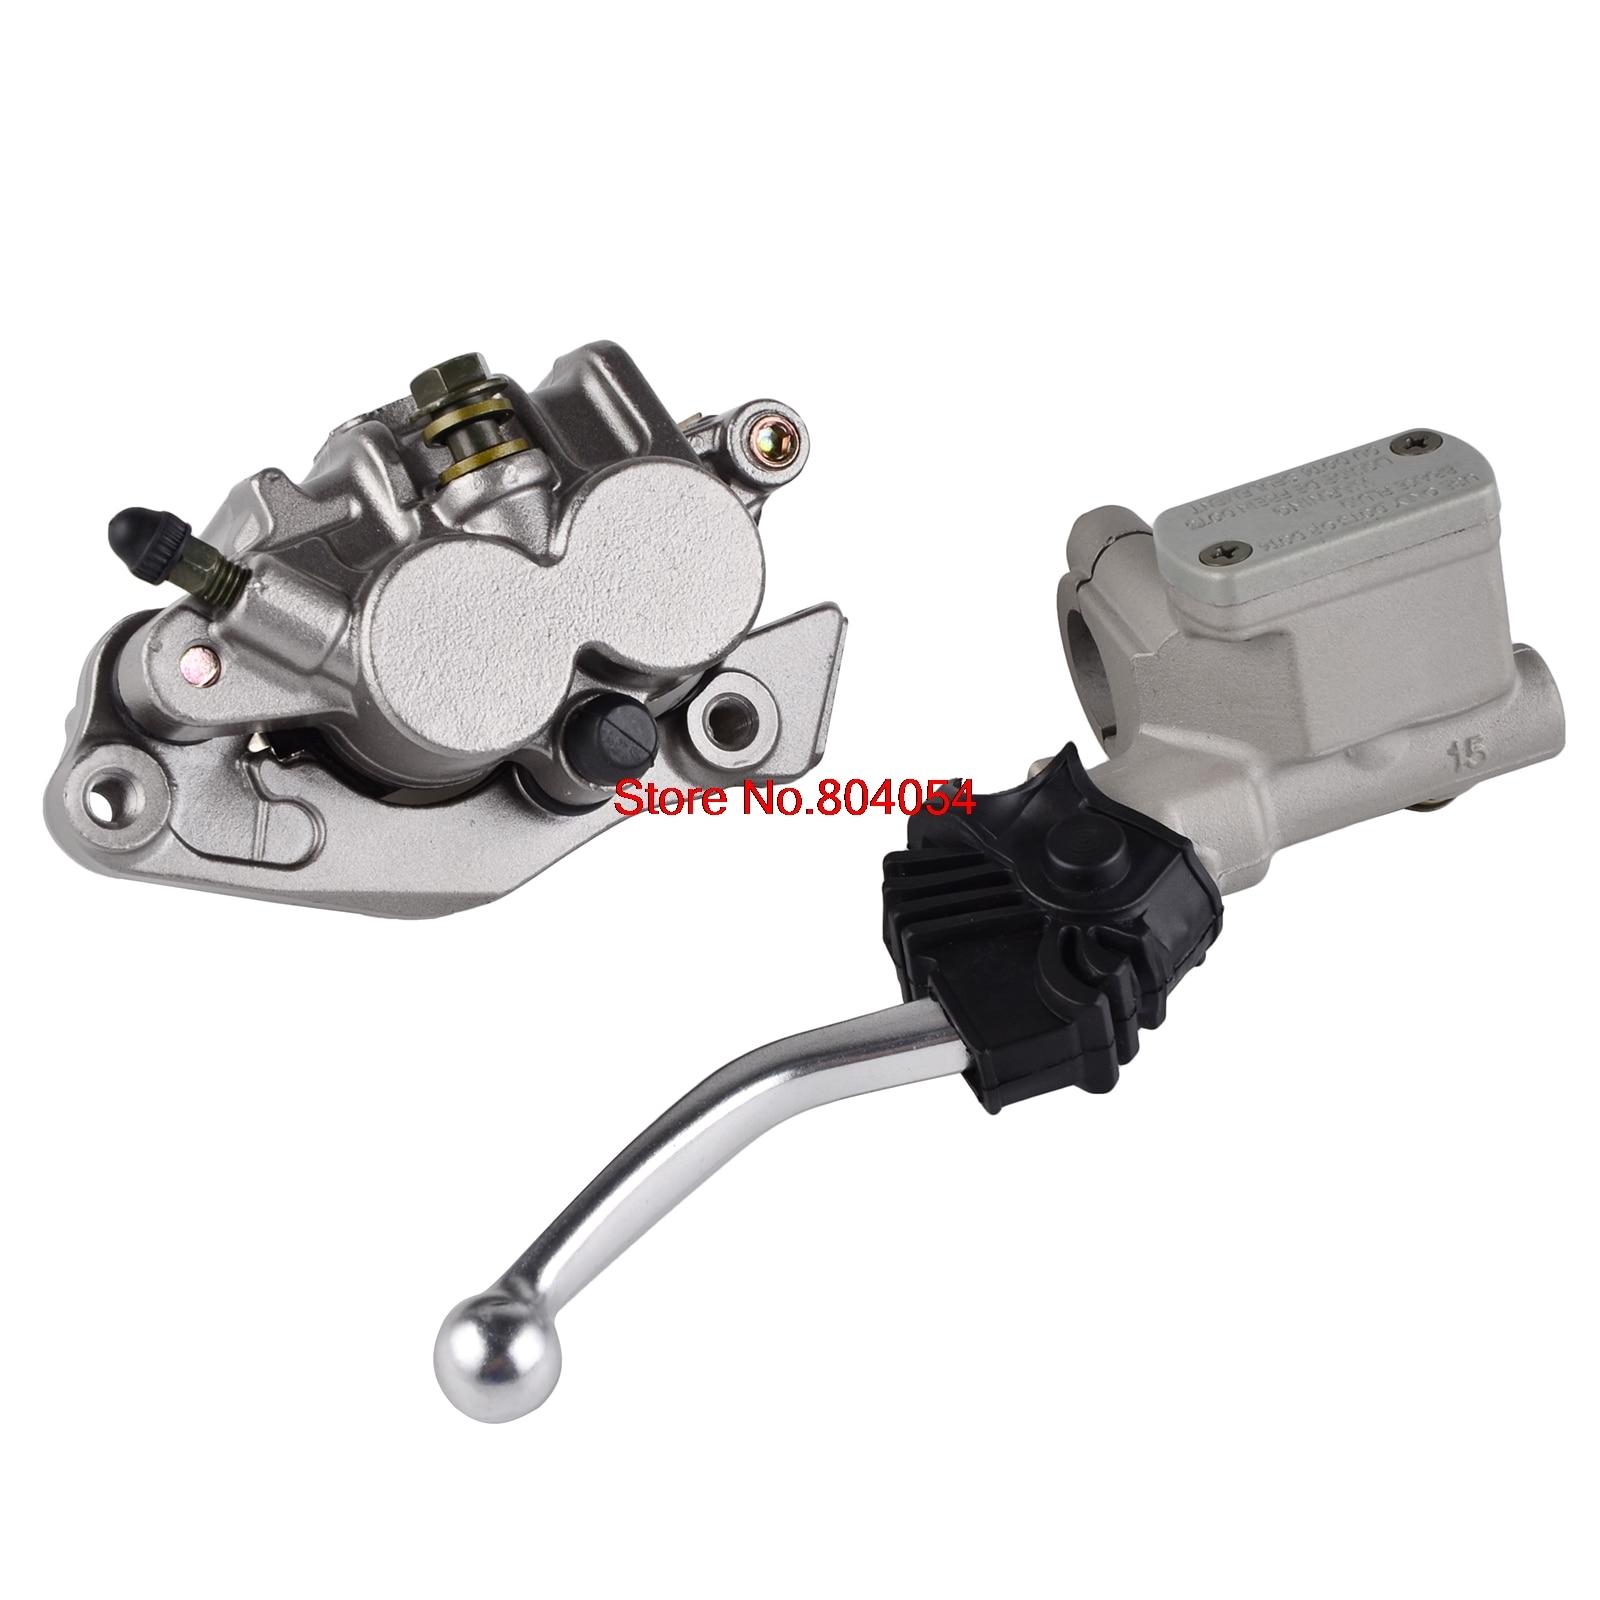 Front Master Cylinder Lever Brake Caliper Pads For Honda XR250R XR400R XR600R XR650L XR650R